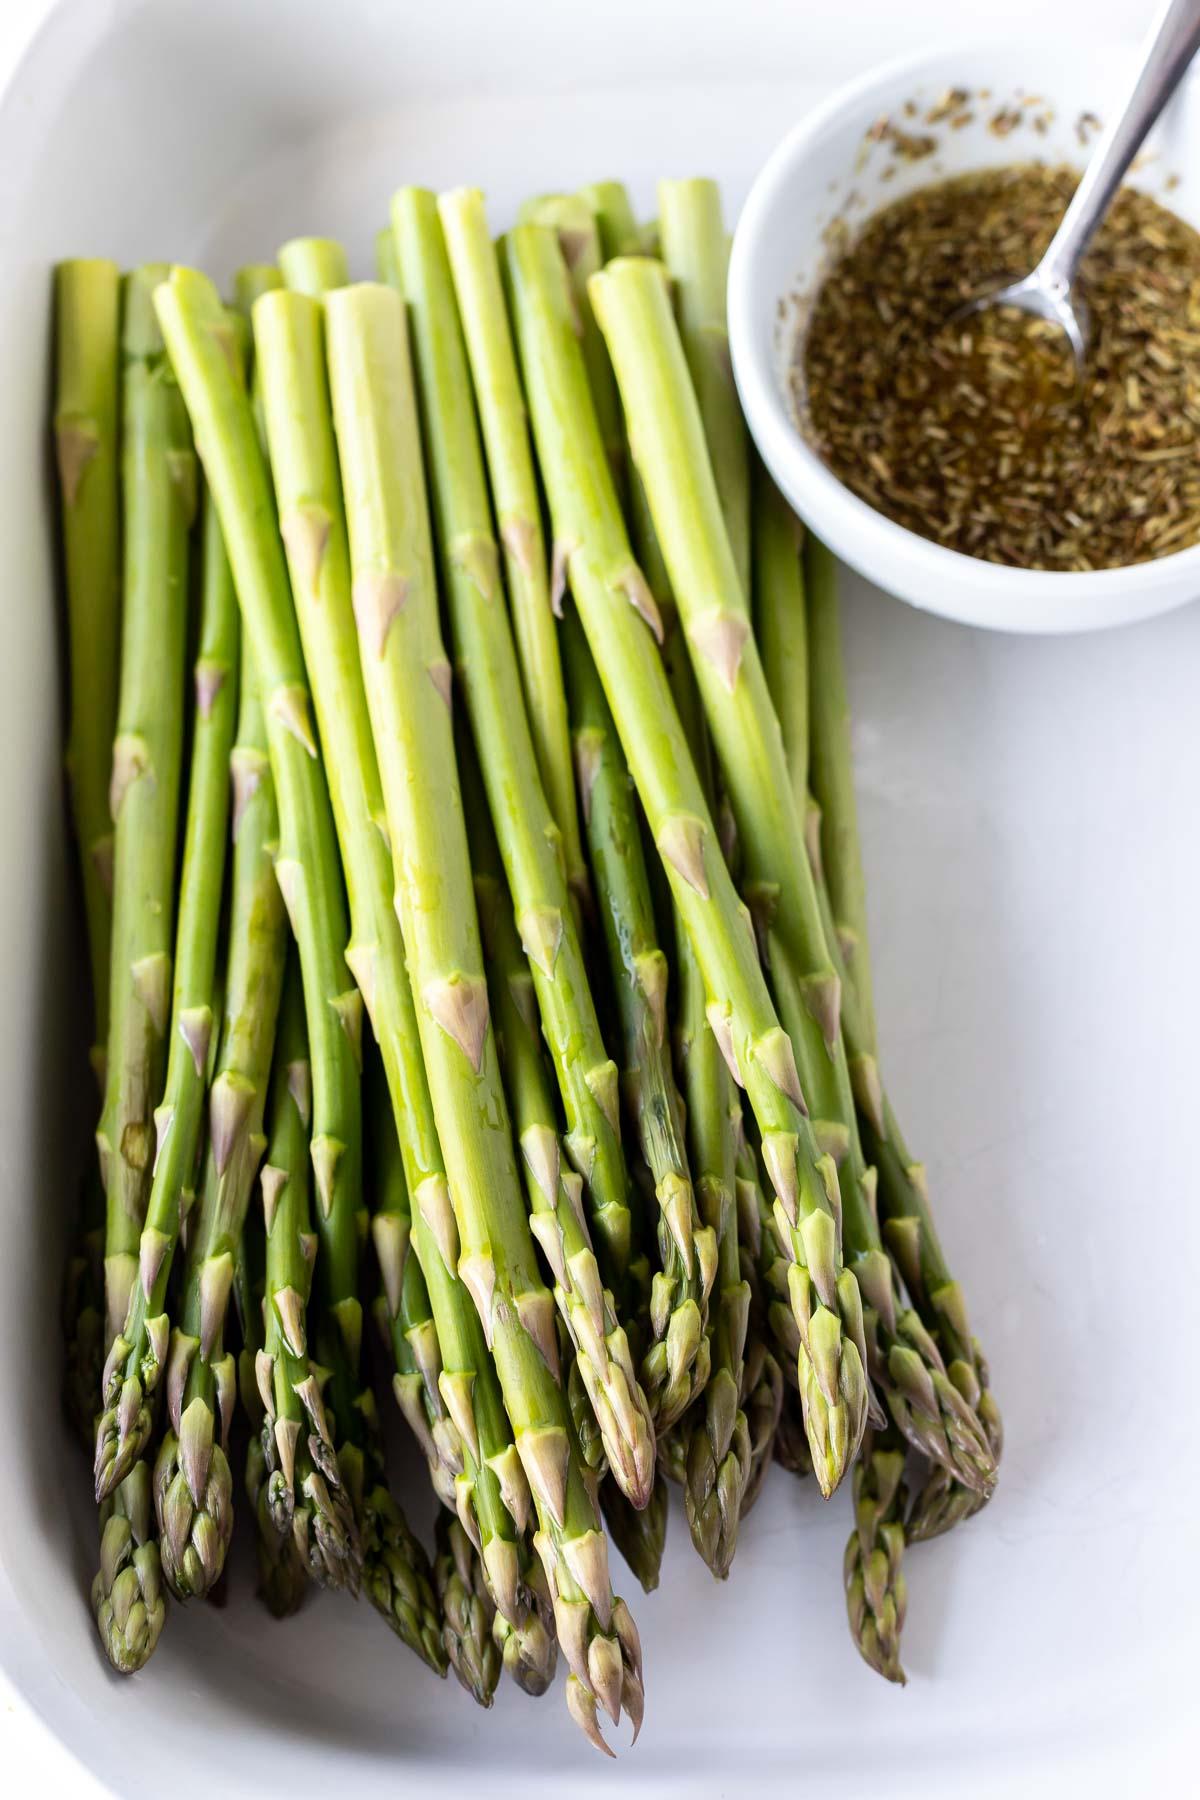 raw asparagus next to oil mixture